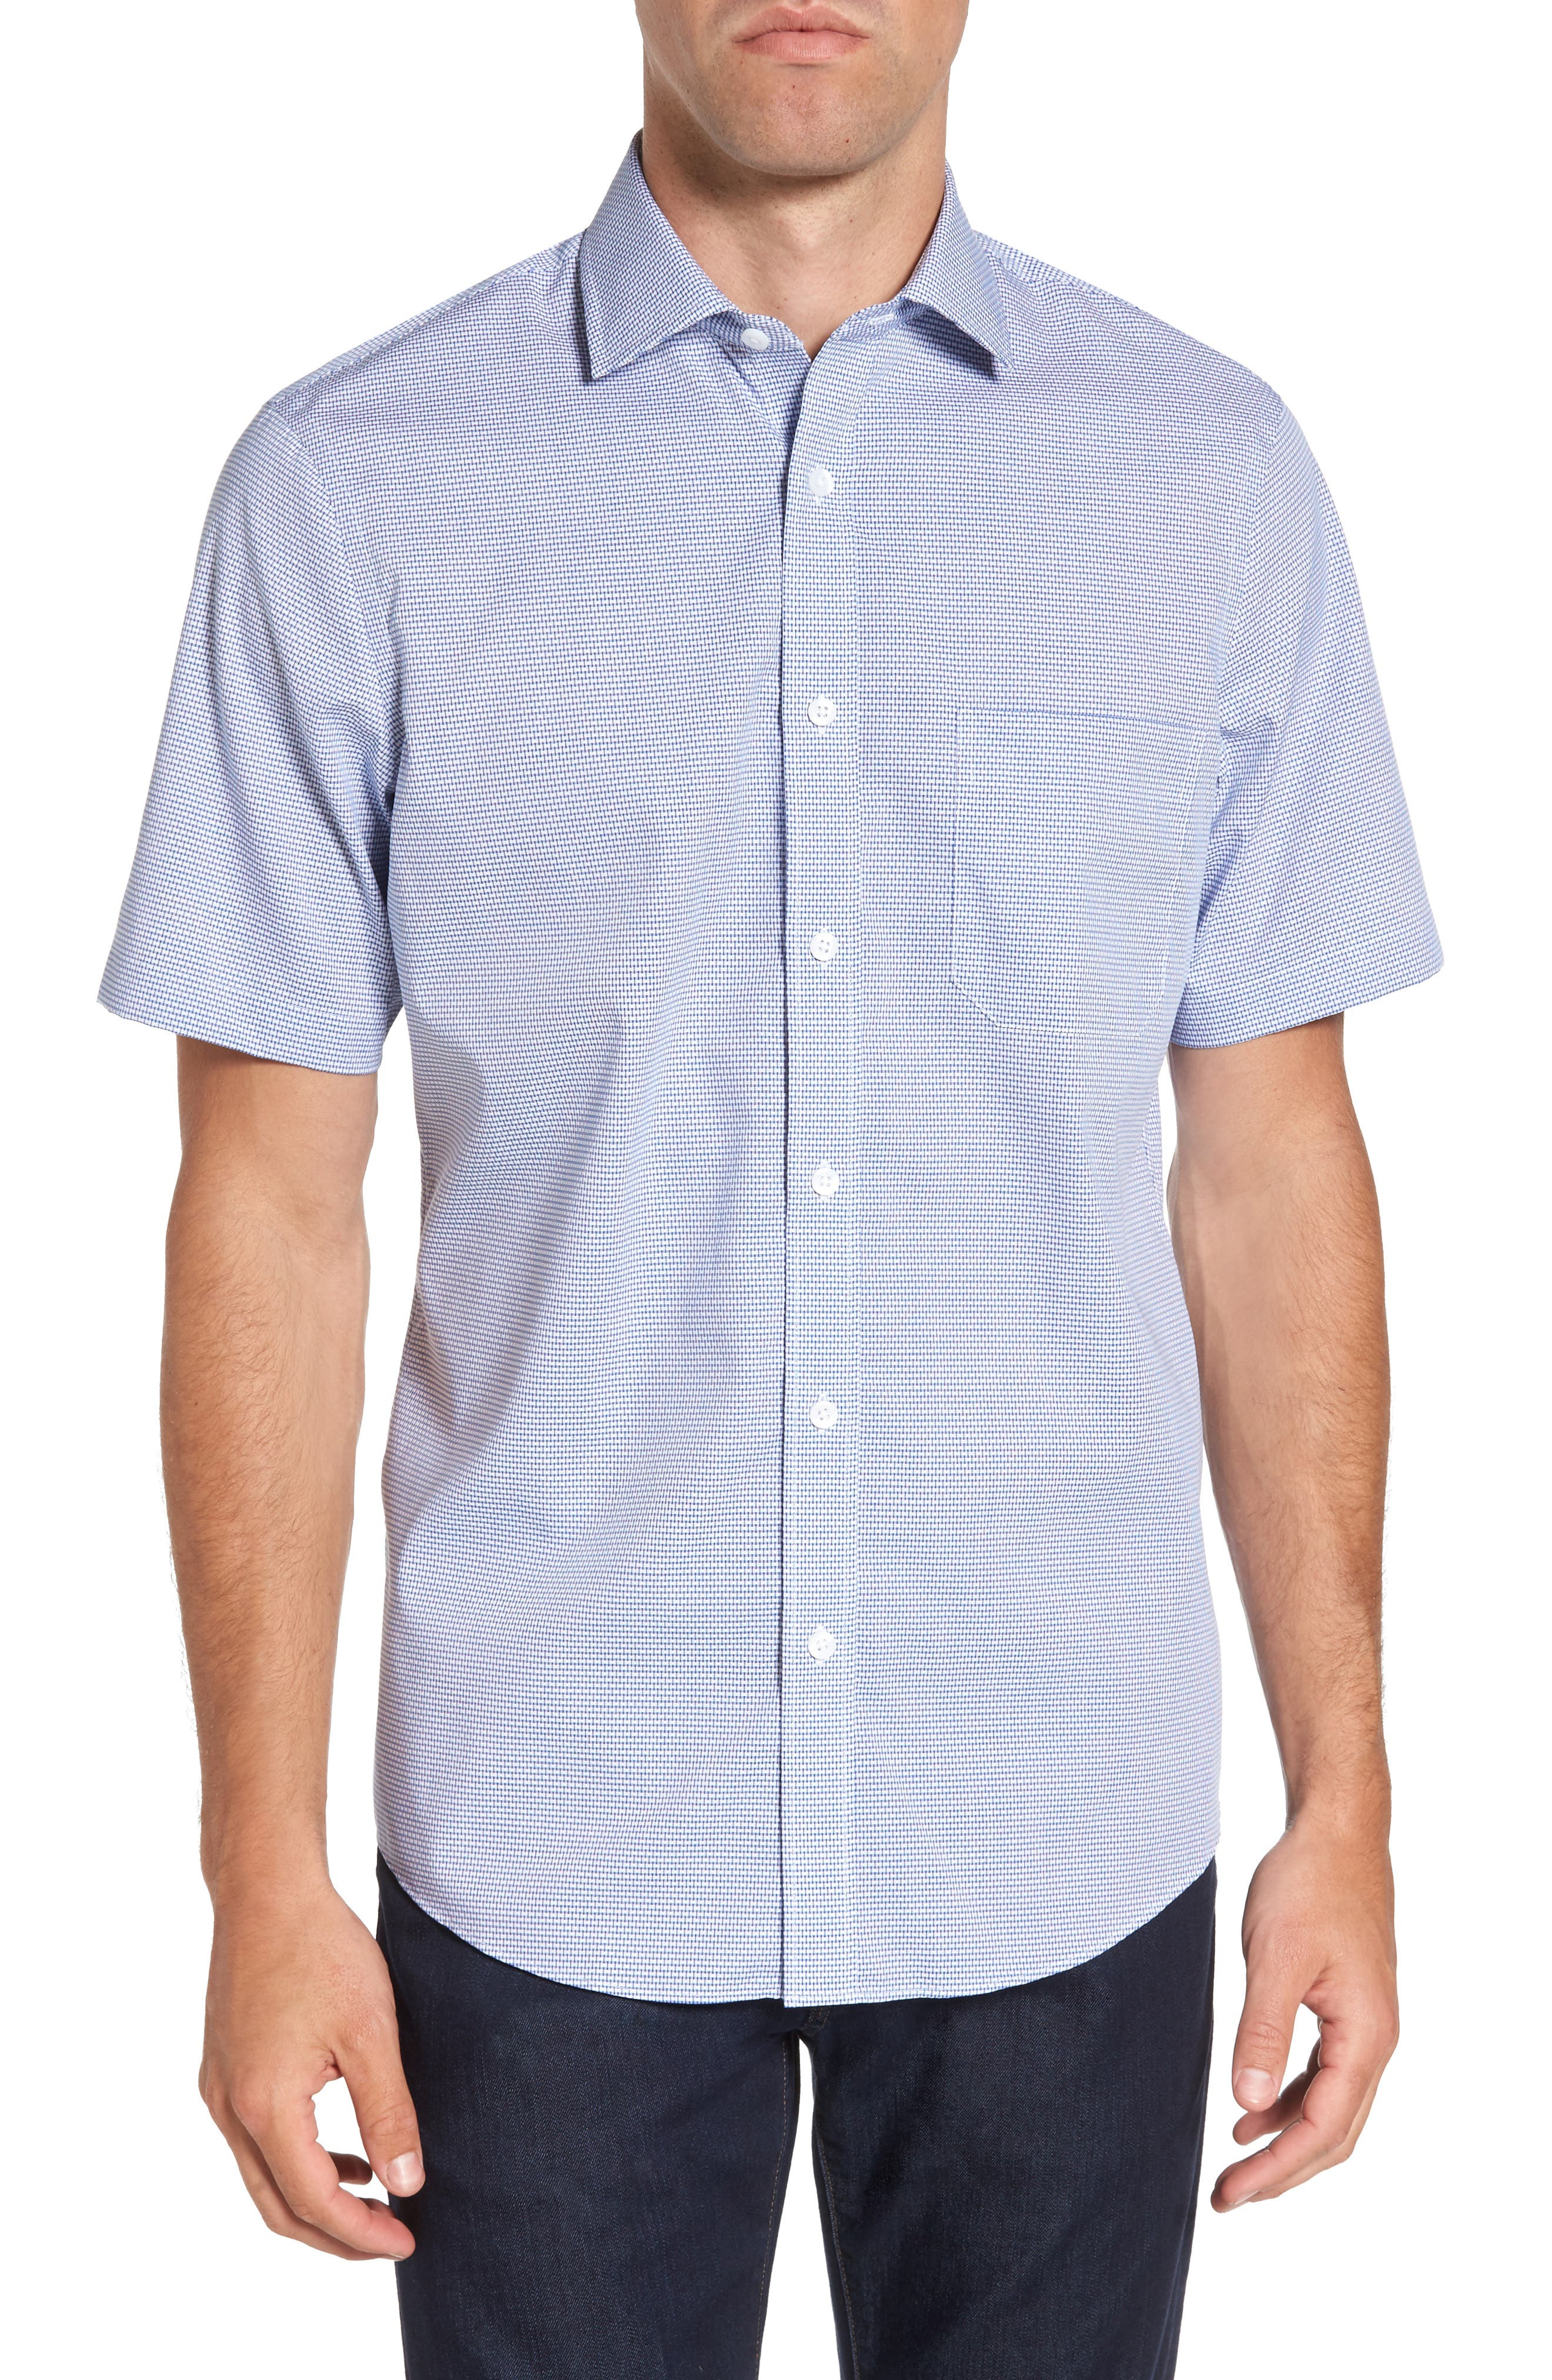 Nordstrom Men's Shop Regular Fit Dobby Sport Shirt (Regular & Tall)